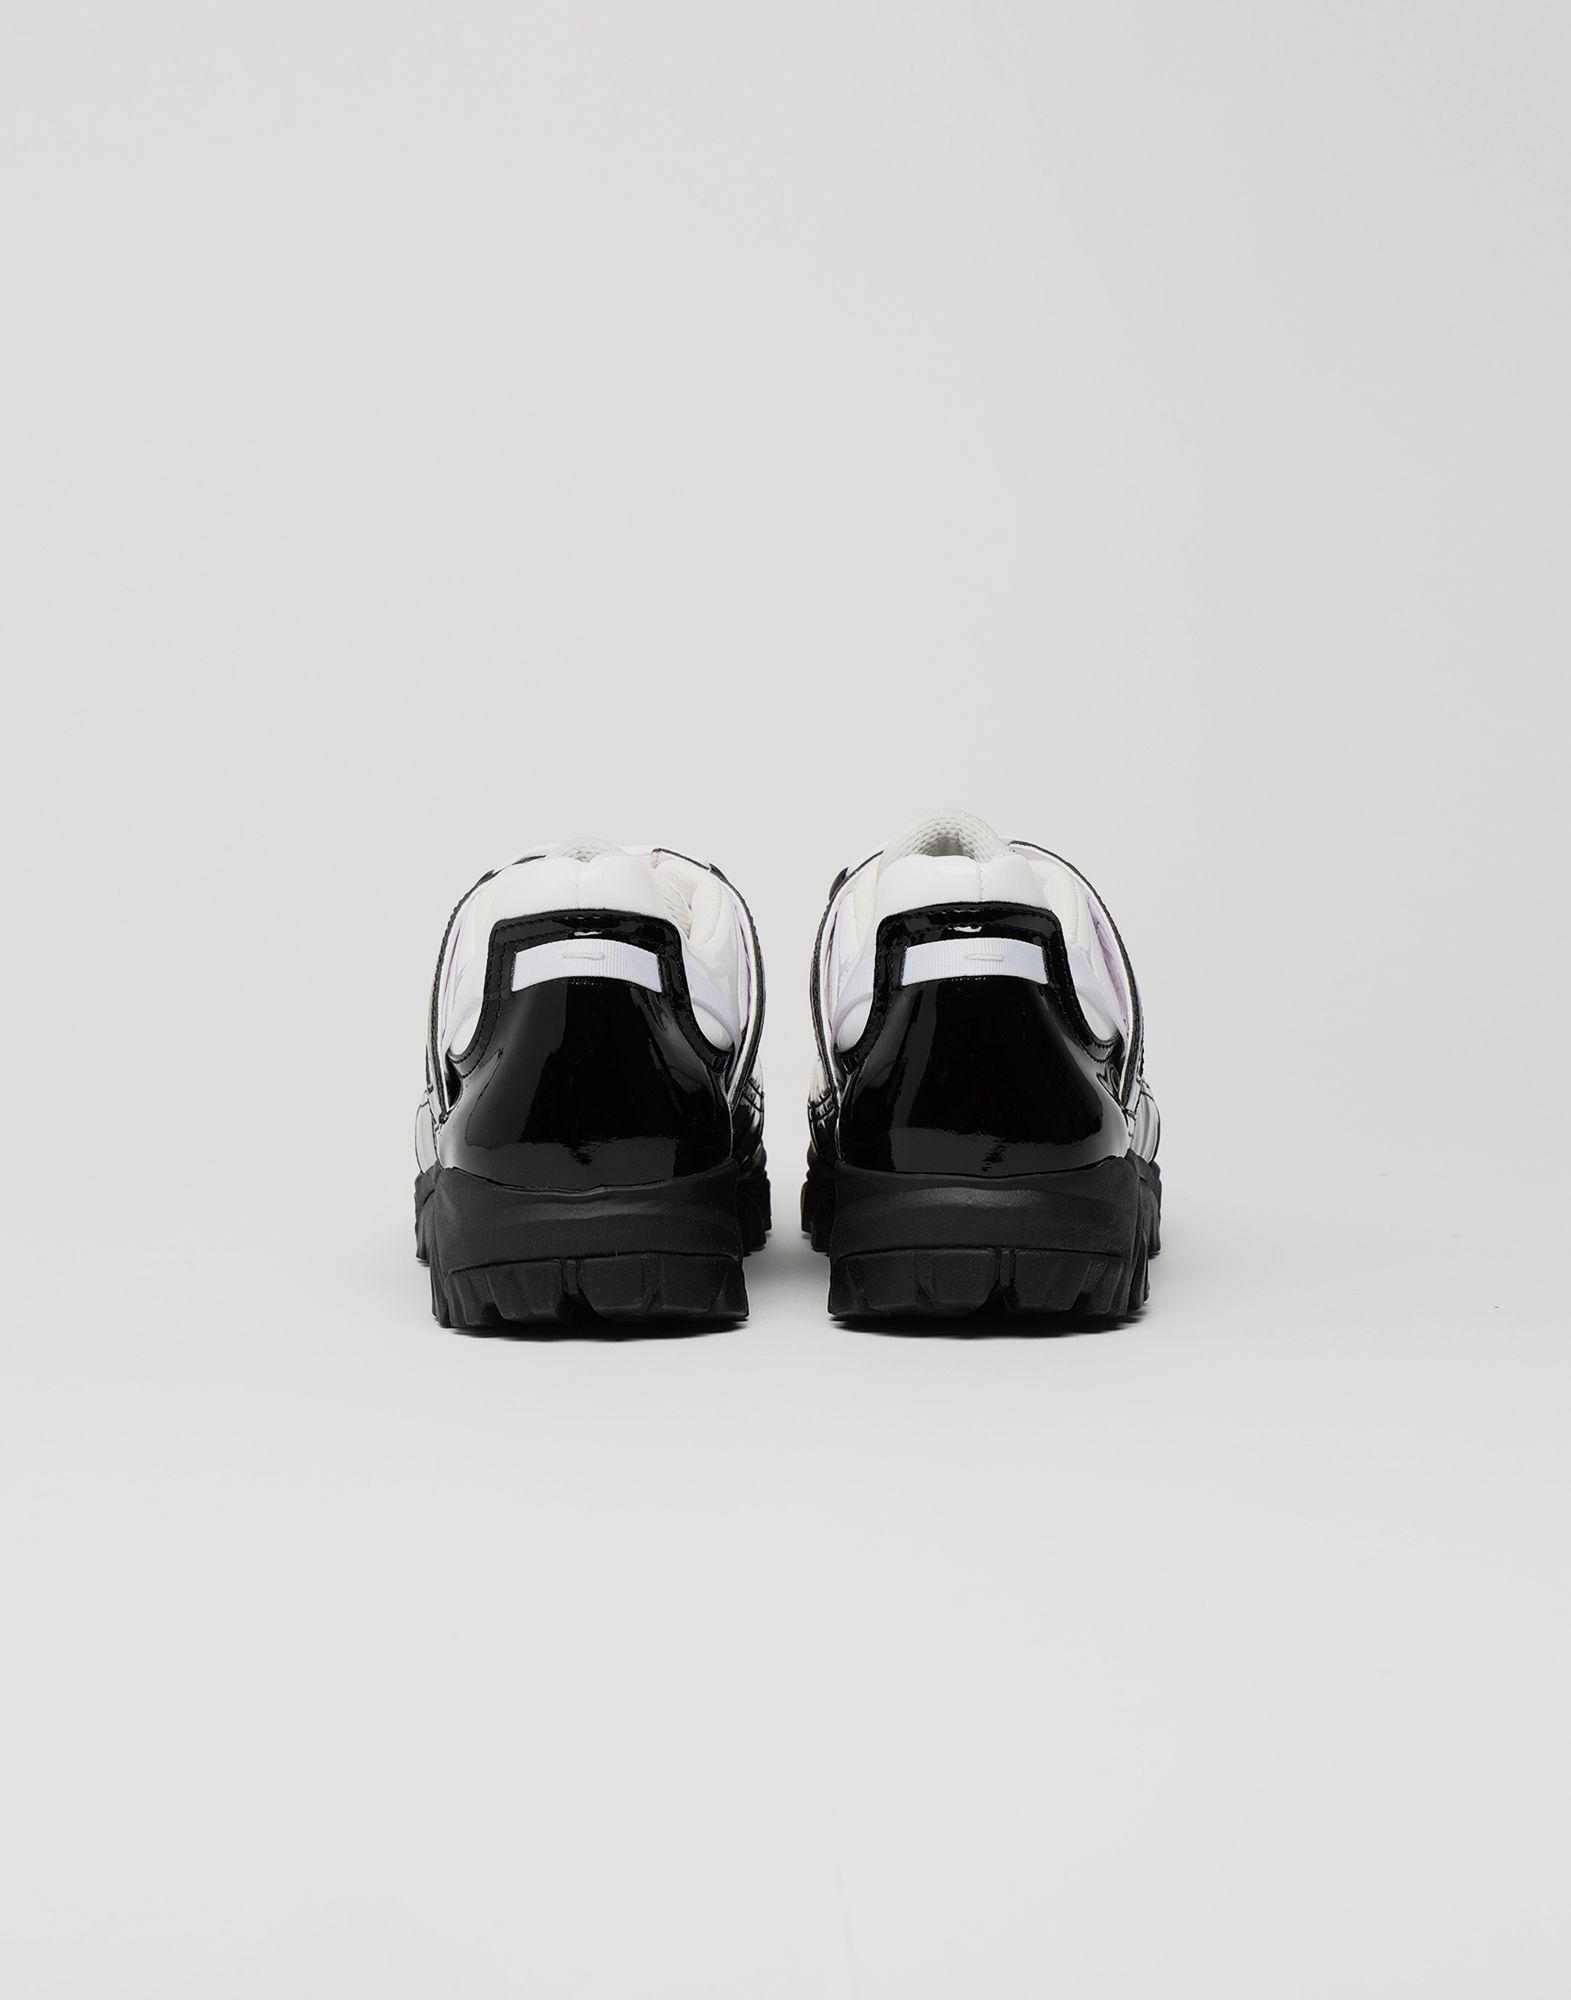 MAISON MARGIELA Sneakers Security aus Lackleder Sneakers Herren d